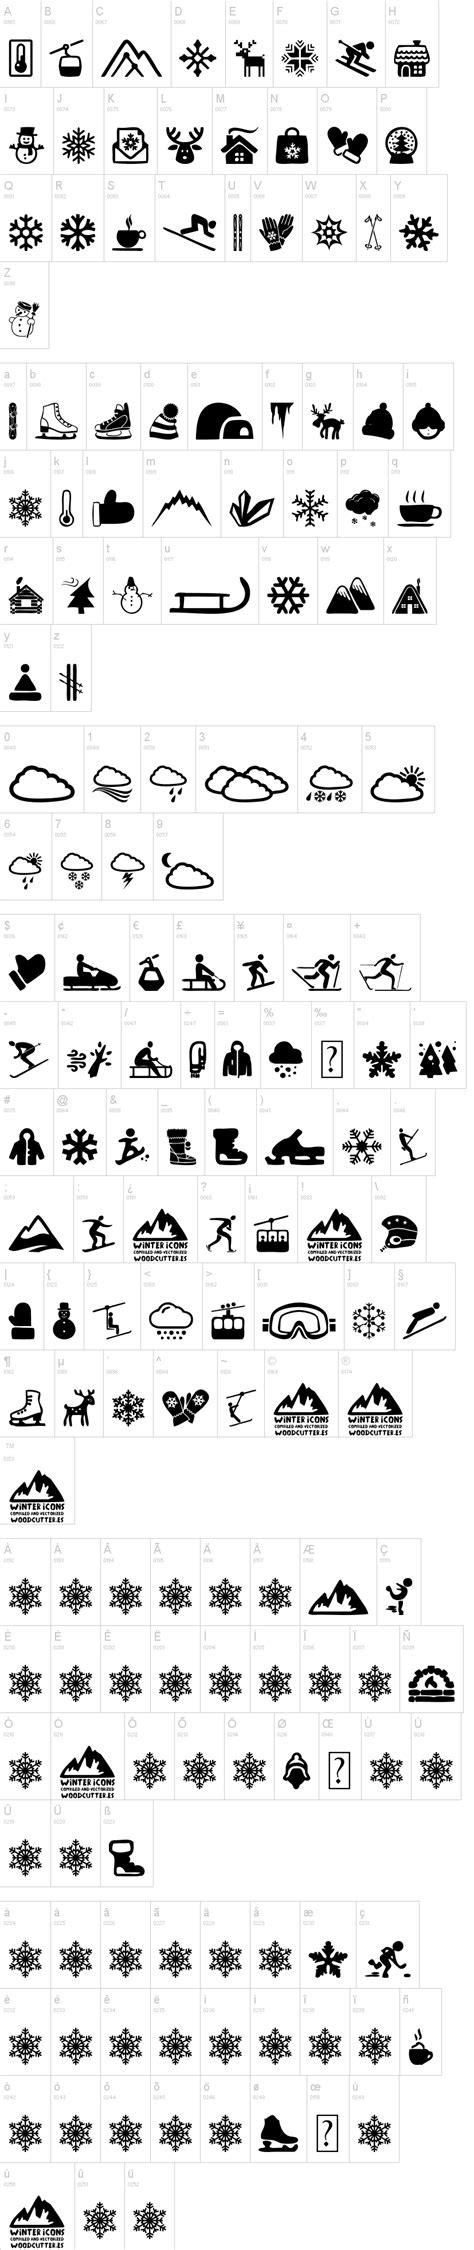 dafont winter winter icons font dafont com